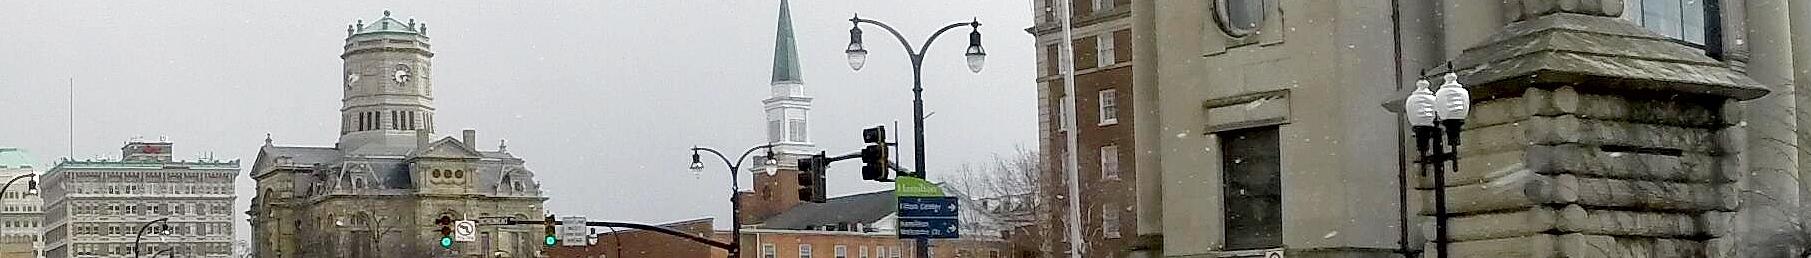 Hamilton (Ohio) – Travel guide at Wikivoyage